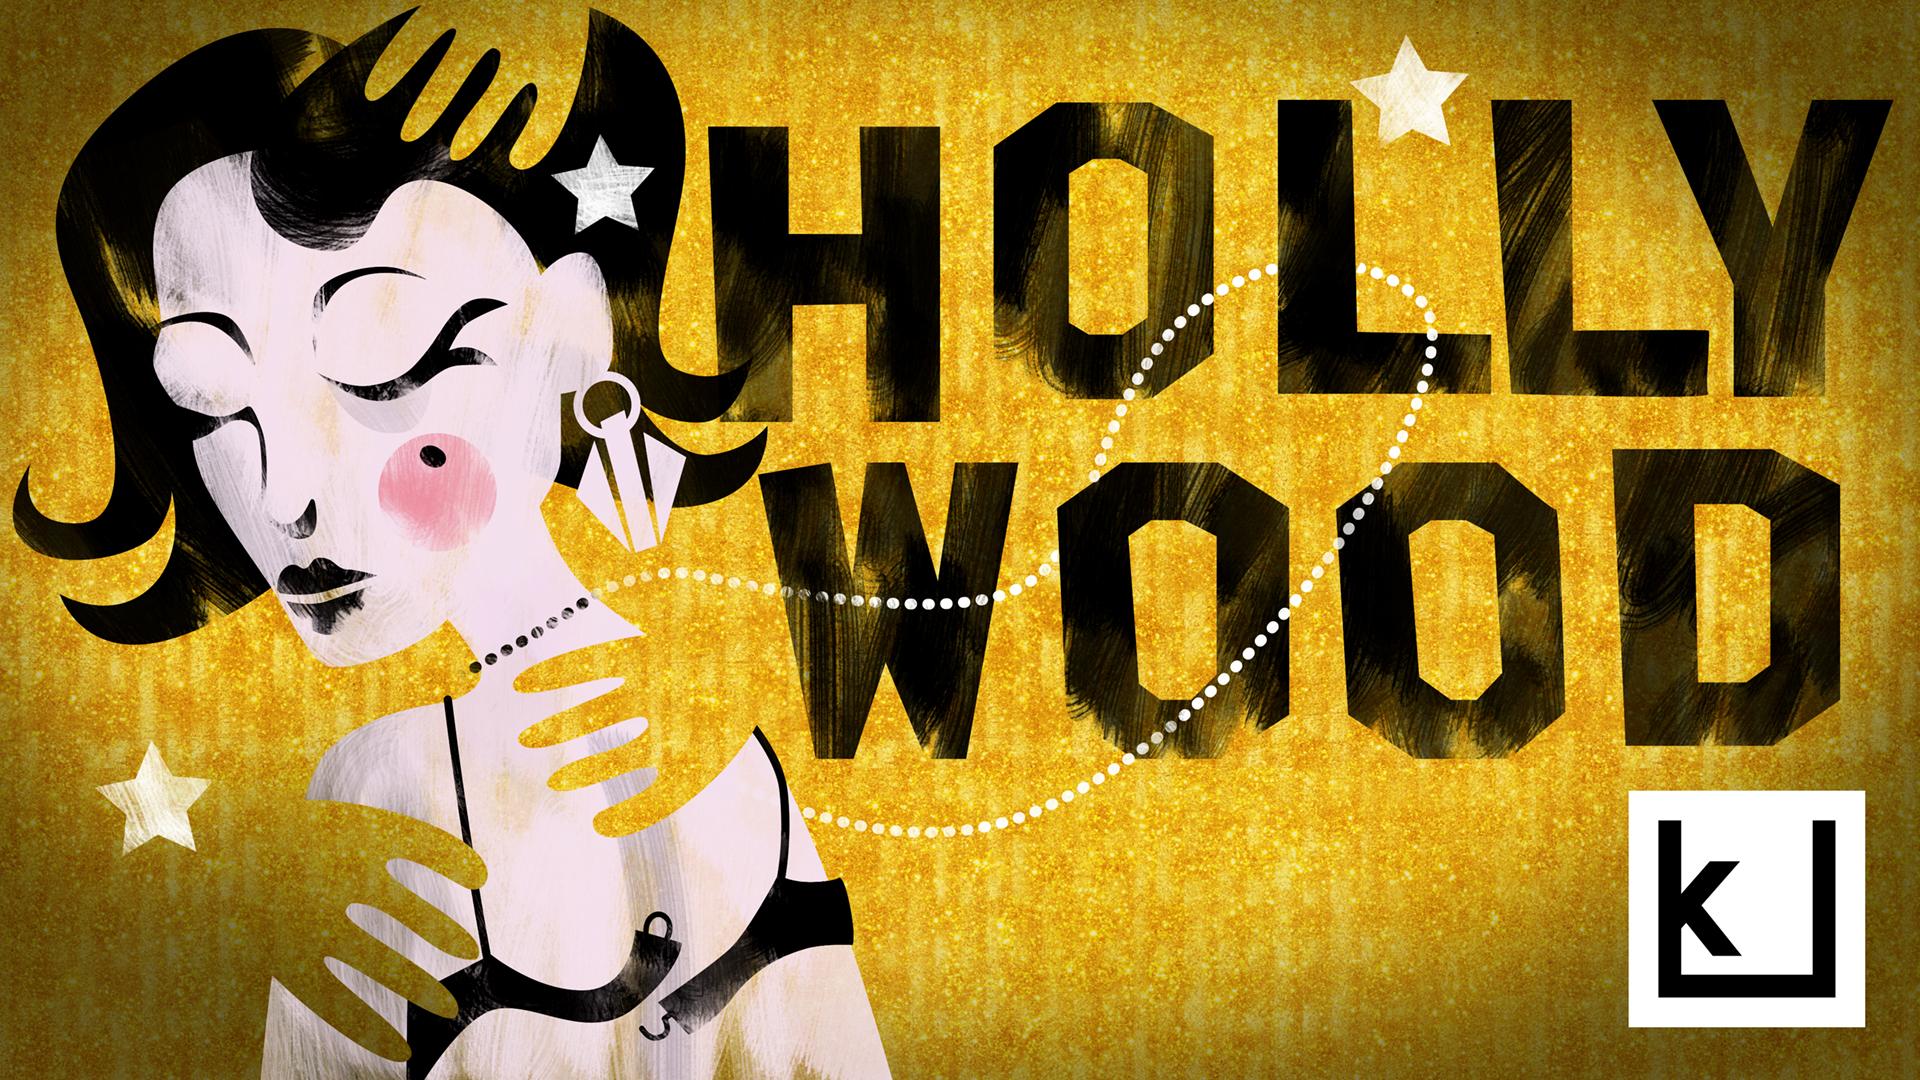 Artikkelikuva_Hollywood_naistenhairinta100v_HD.jpg